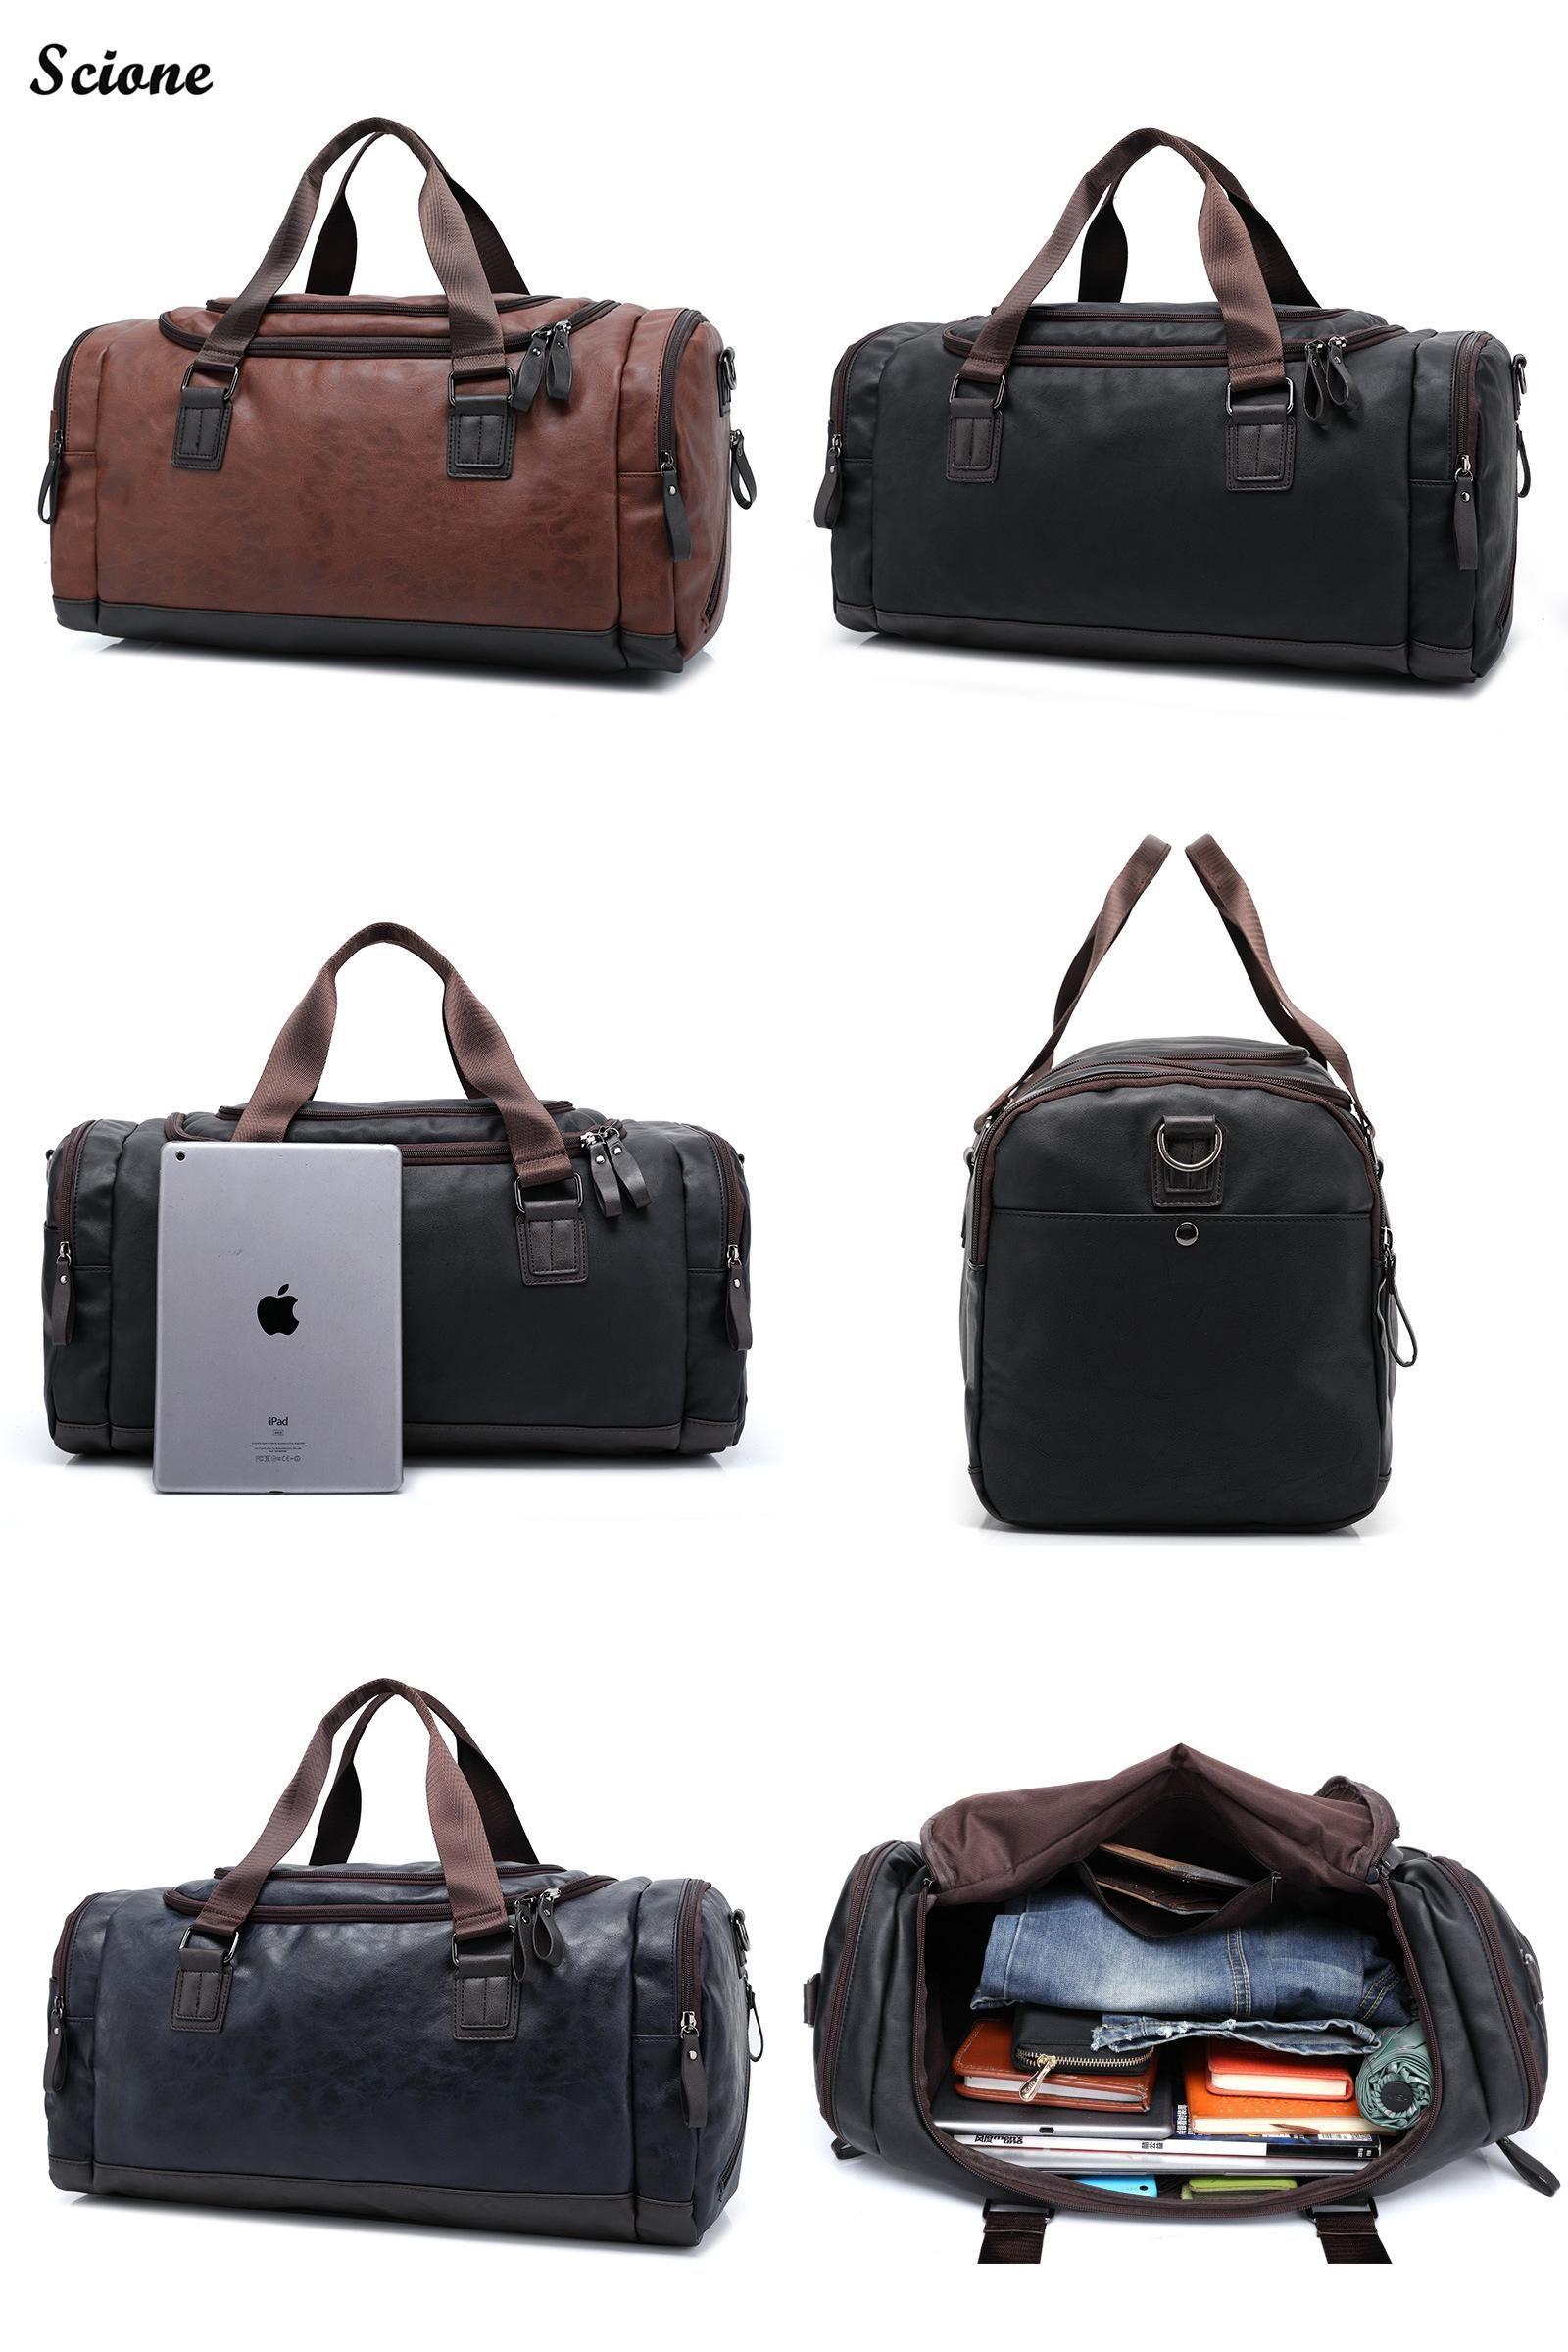 Travel Luggage Duffle Bag Lightweight Portable Handbag Technology Pattern Large Capacity Waterproof Foldable Storage Tote